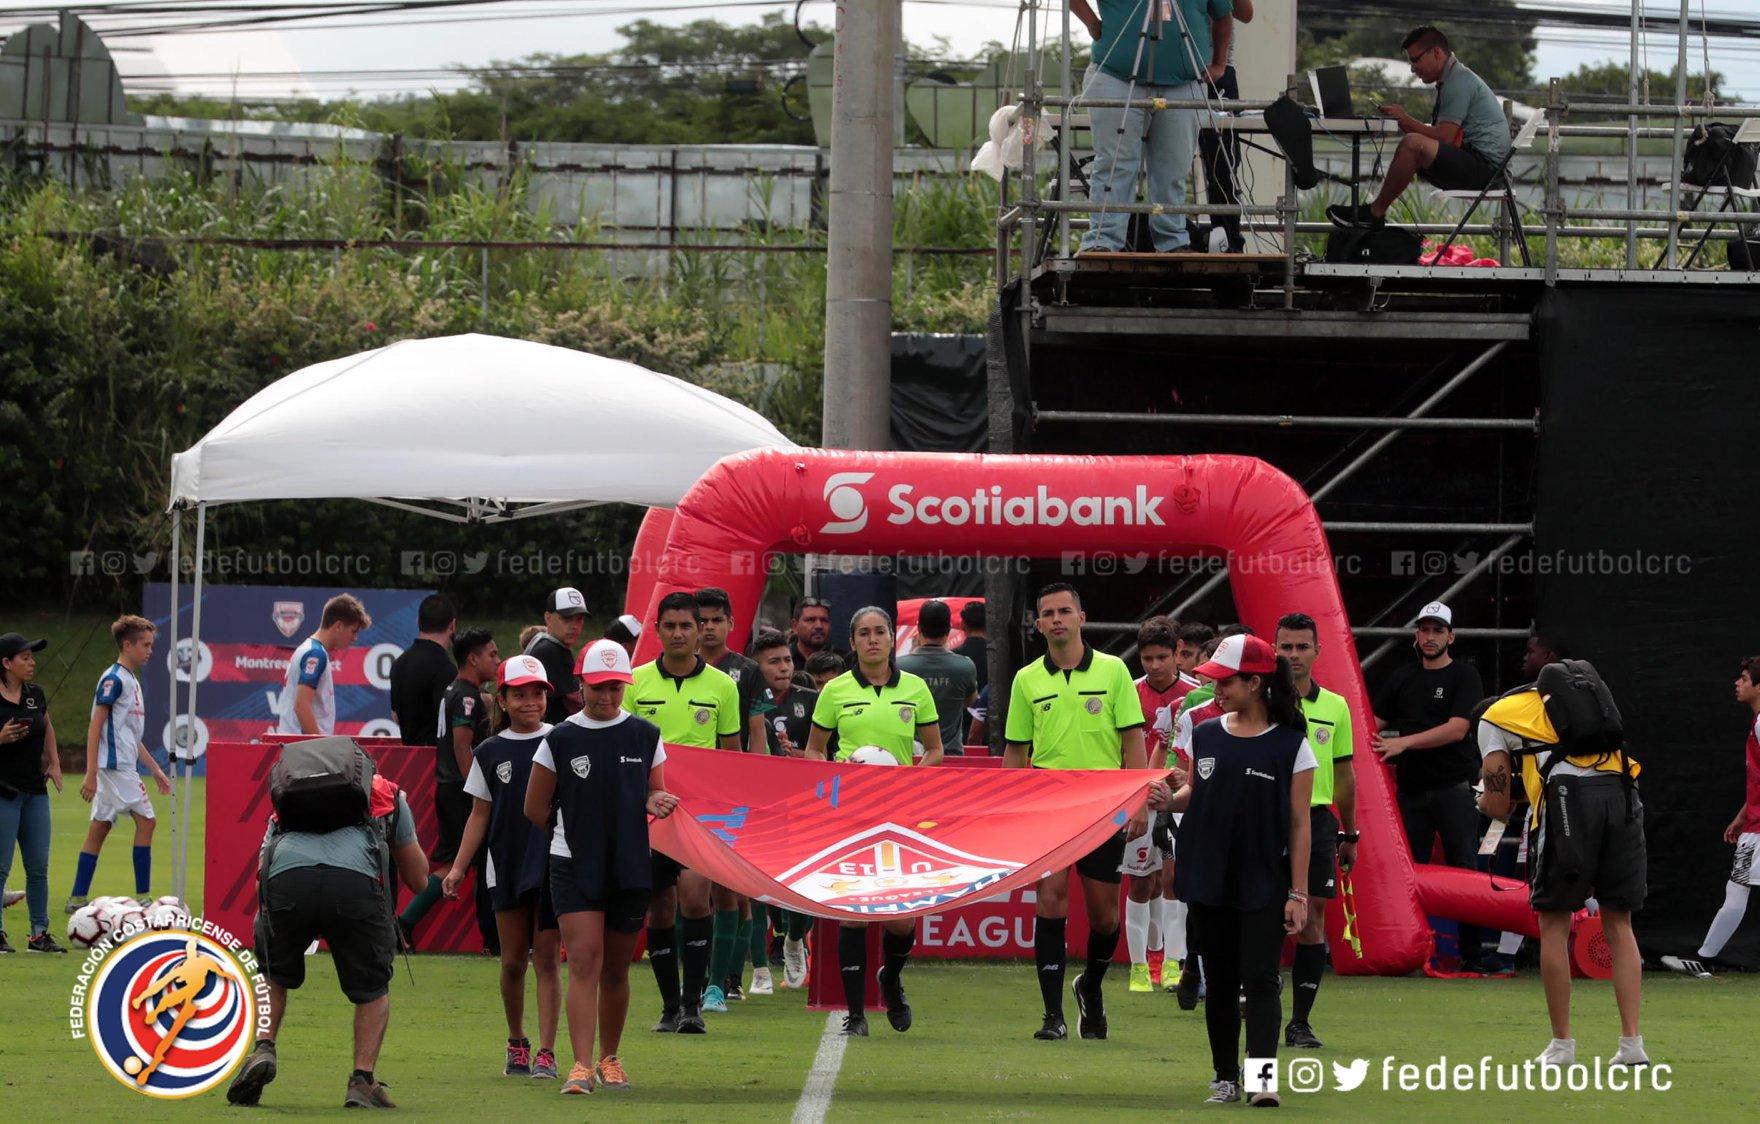 Inició la Liga de Campeones sub 13 de la CONCACAF